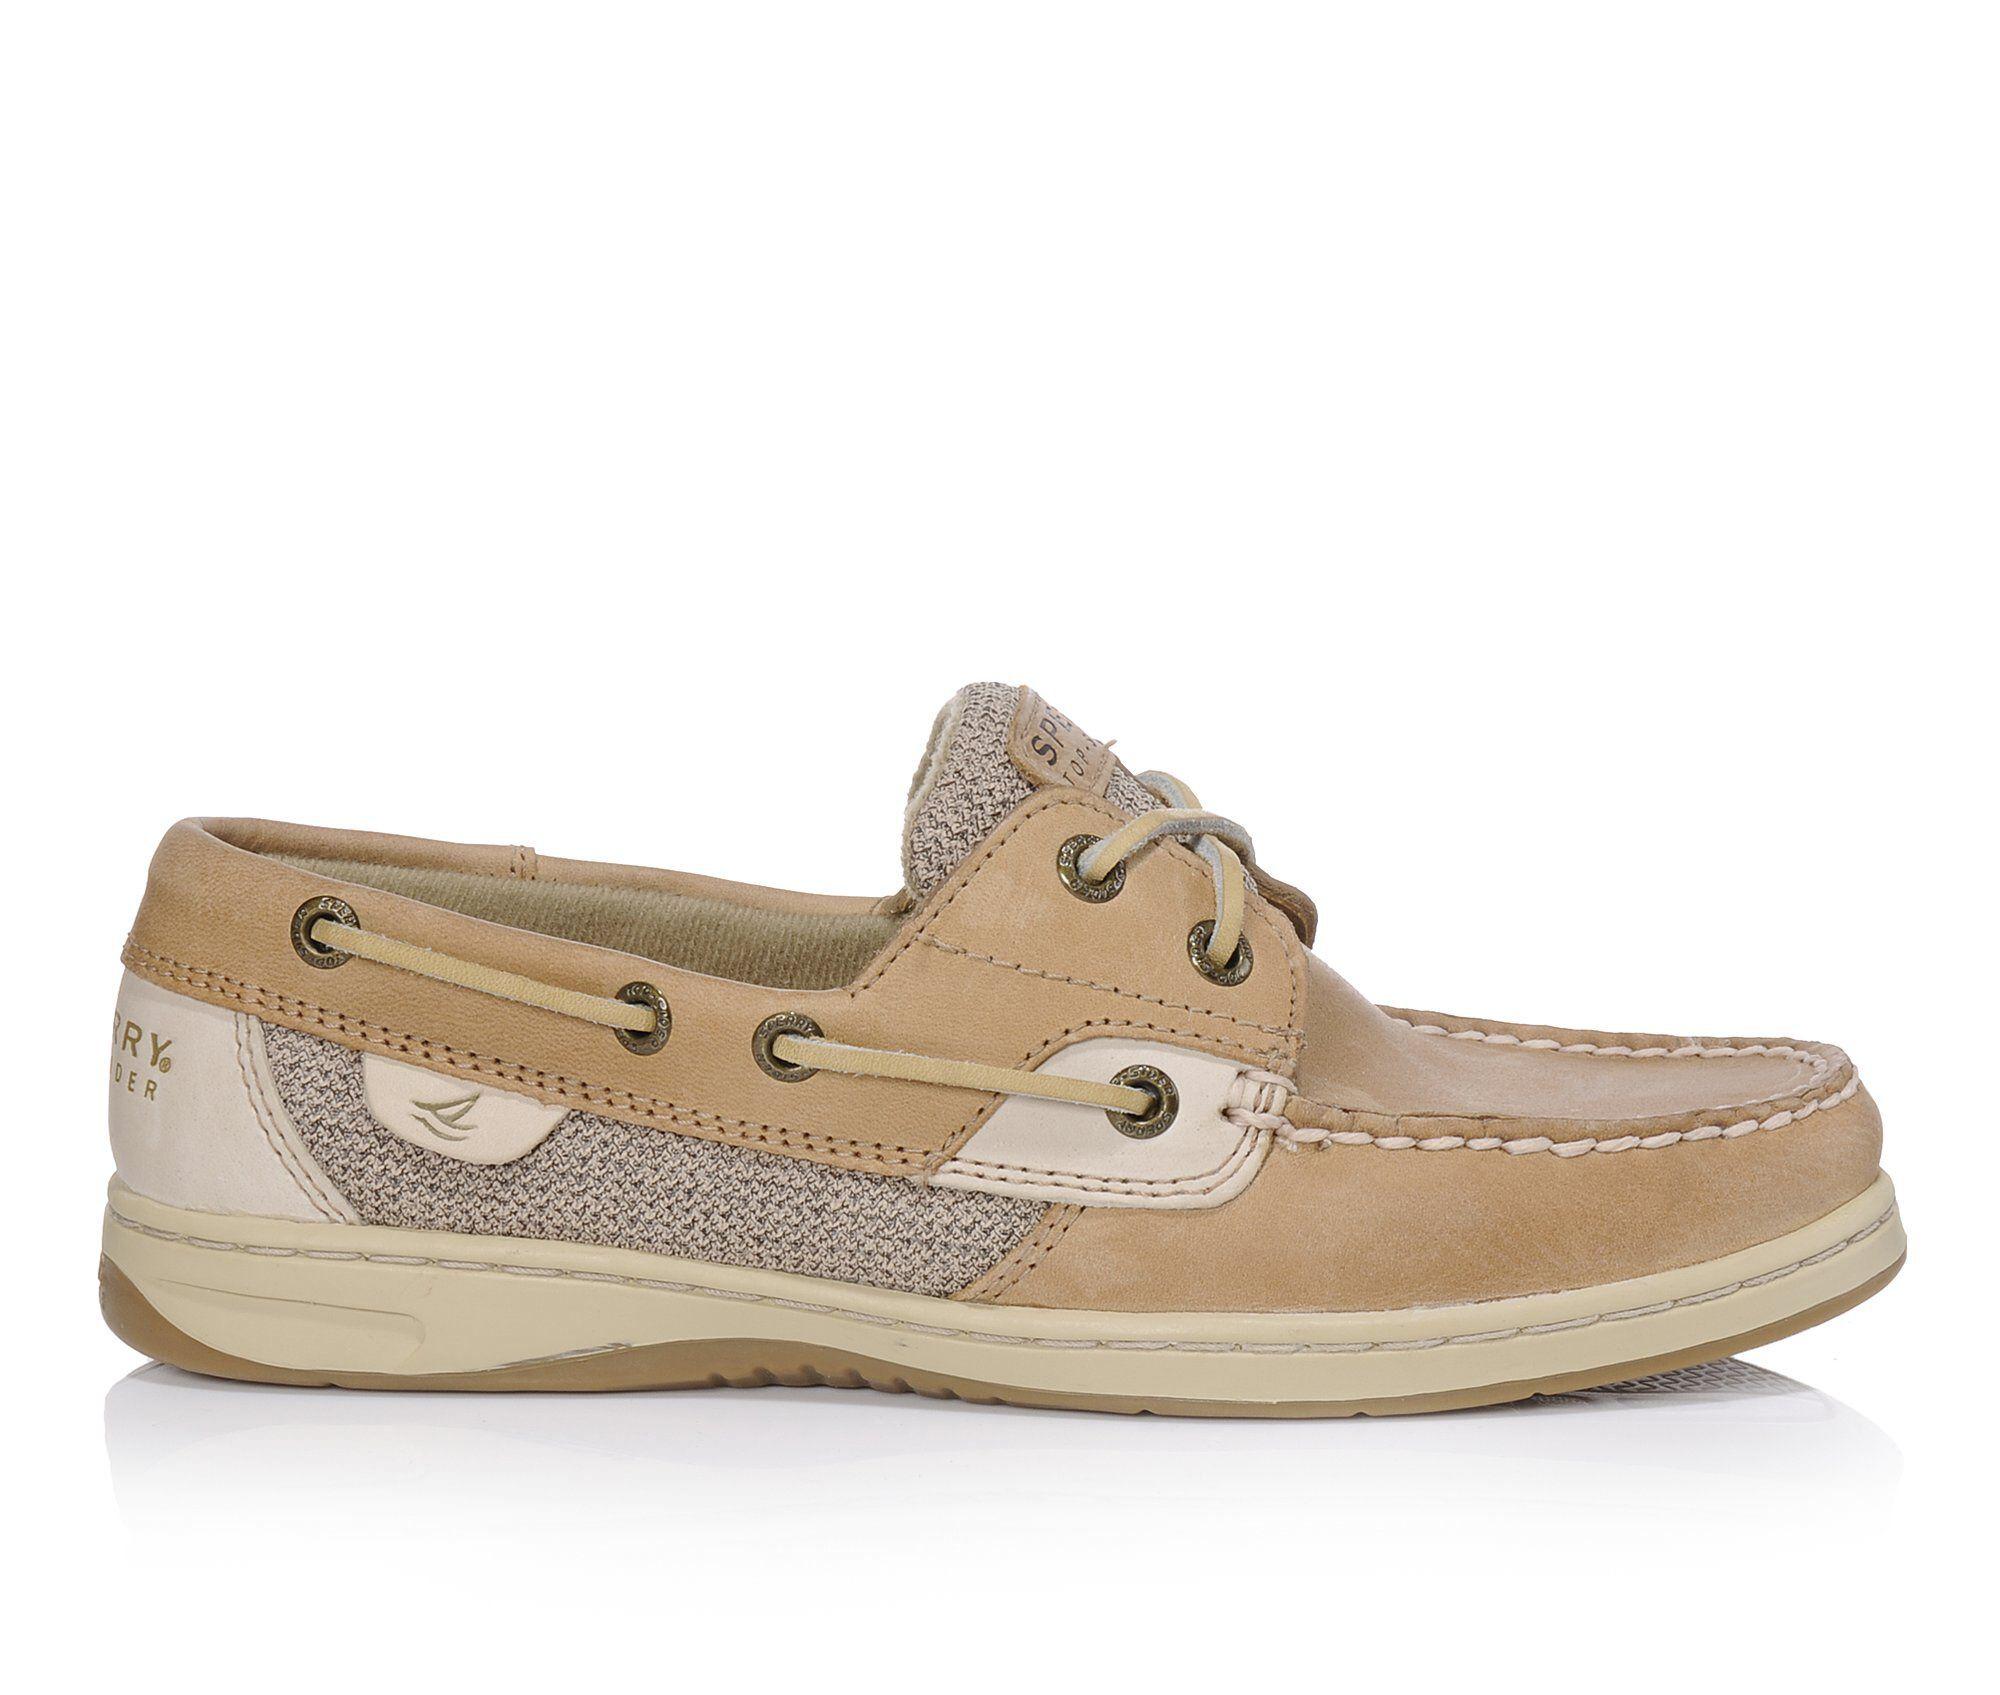 Women's Sperry Bluefish Boat Shoes Linen/Oat